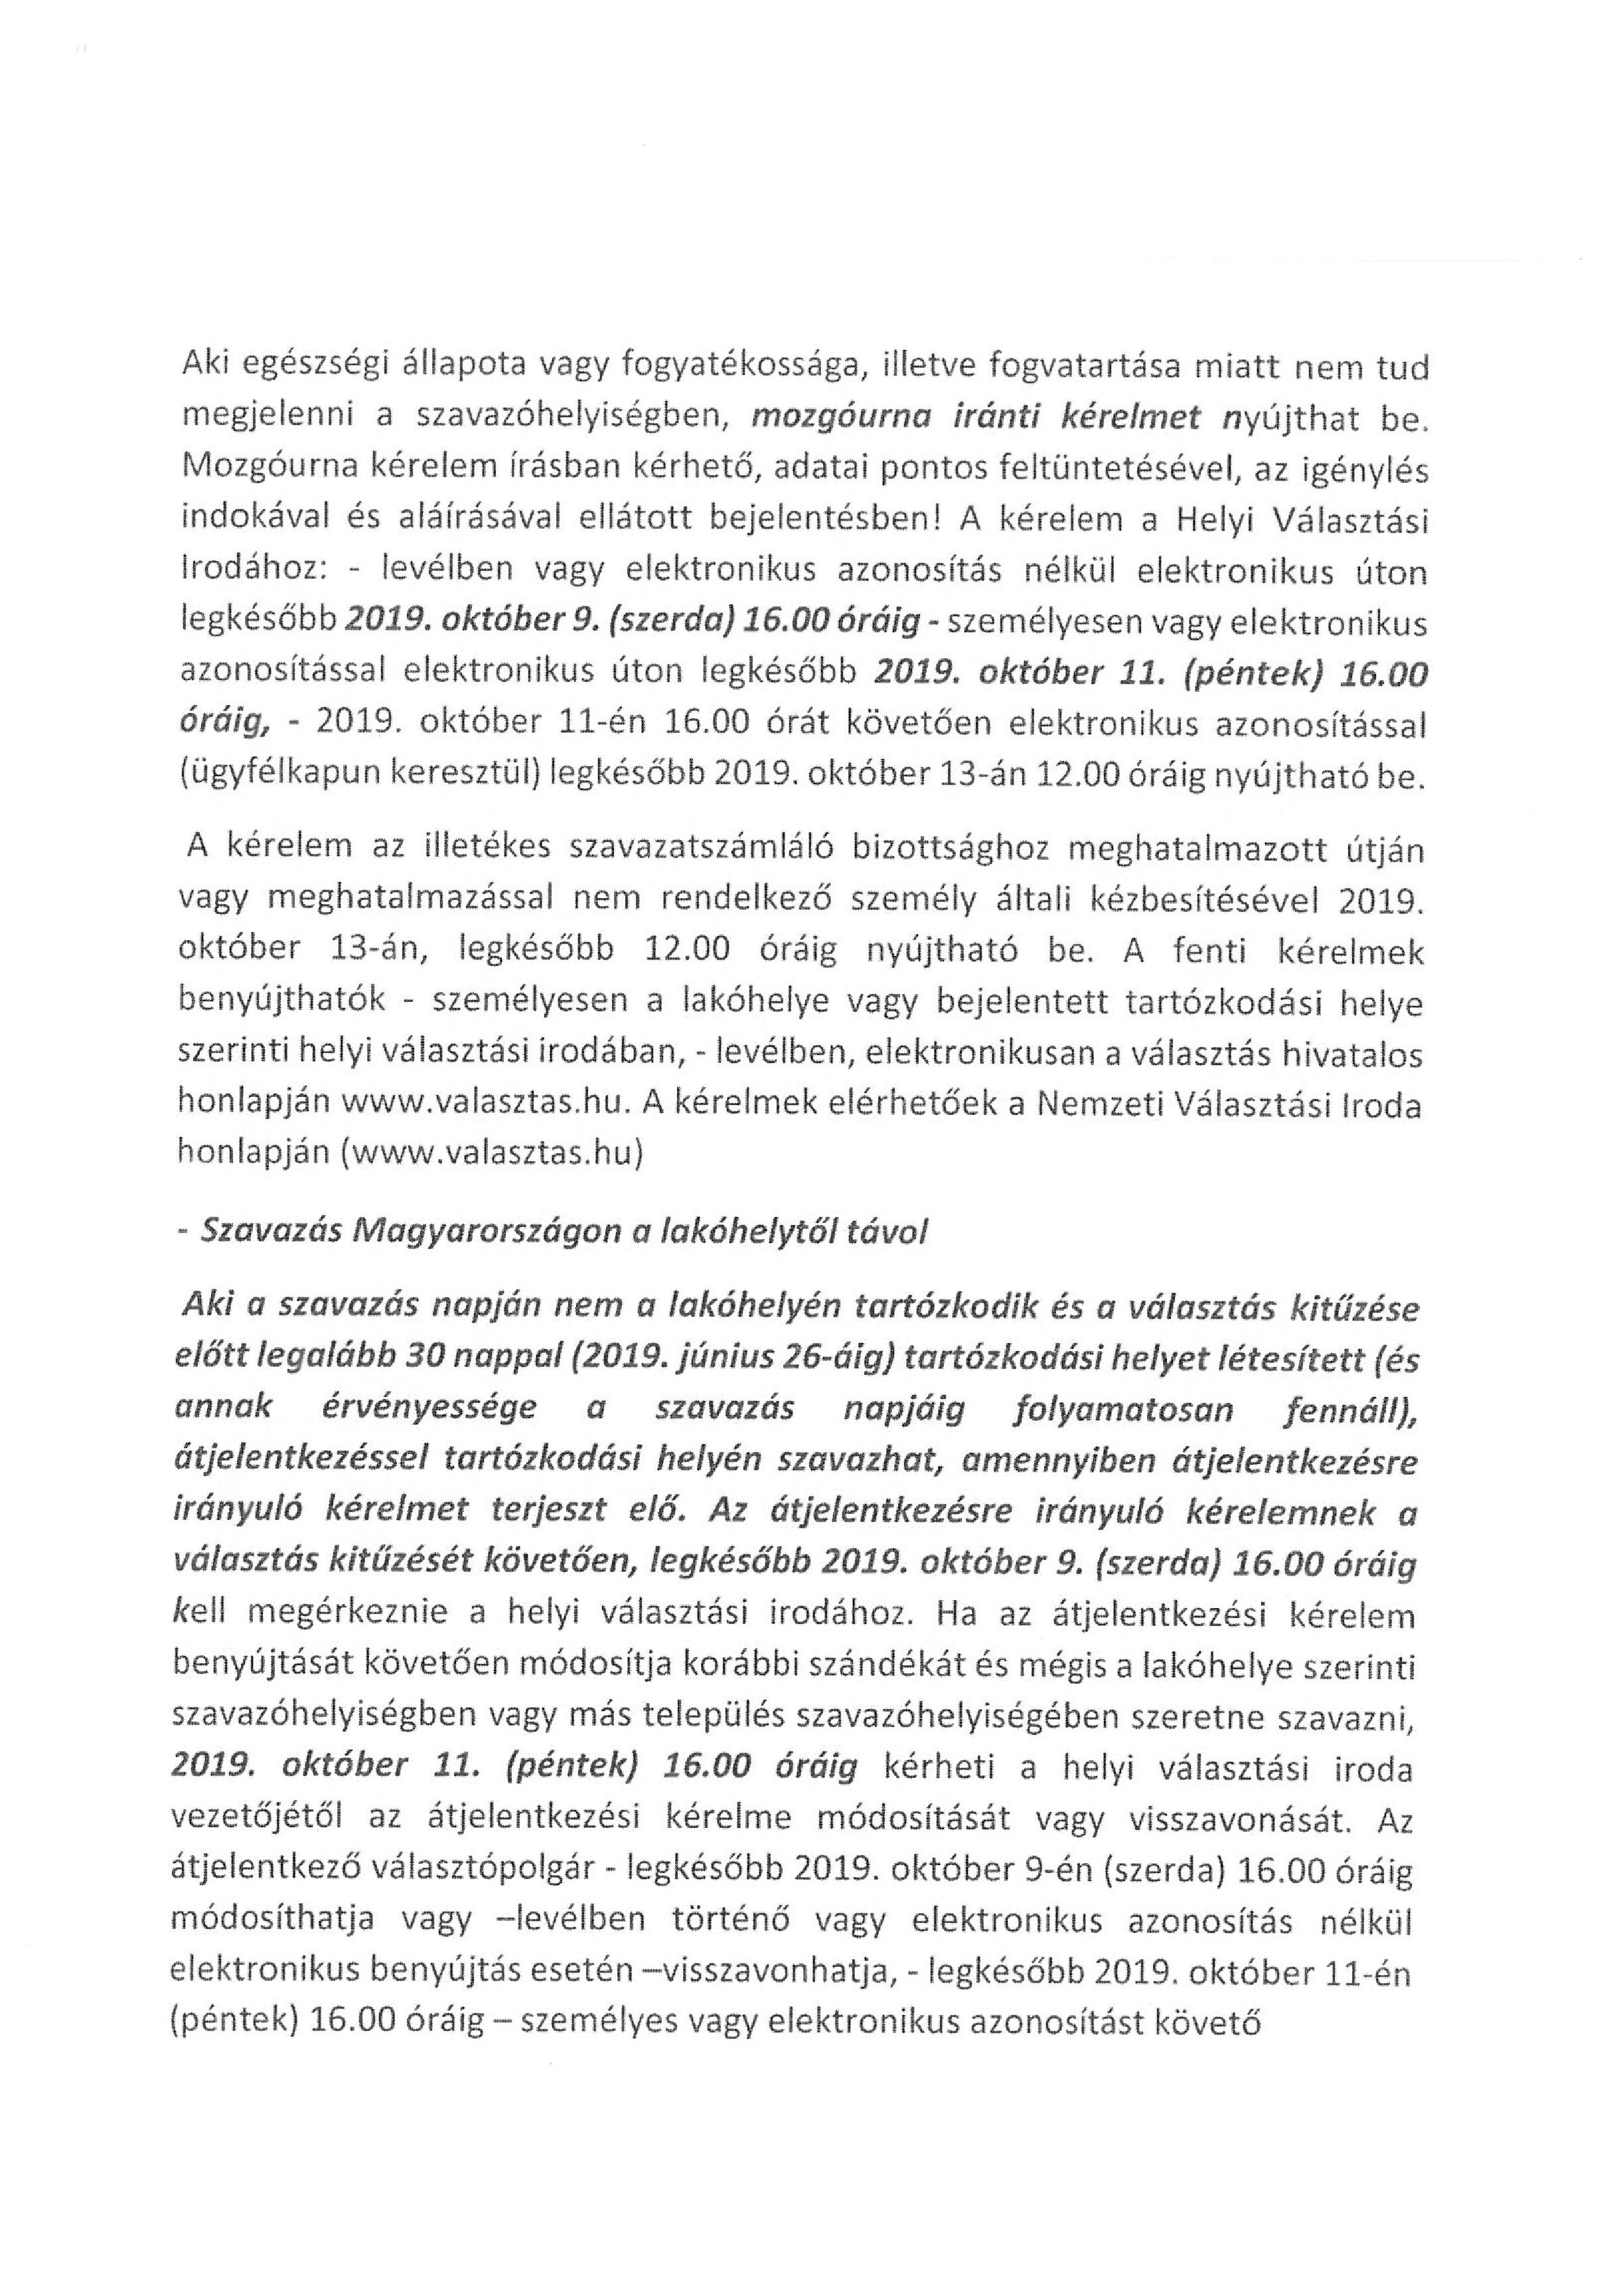 helyi_valasztasi_iroda_kozlemeny-page-003.jpg